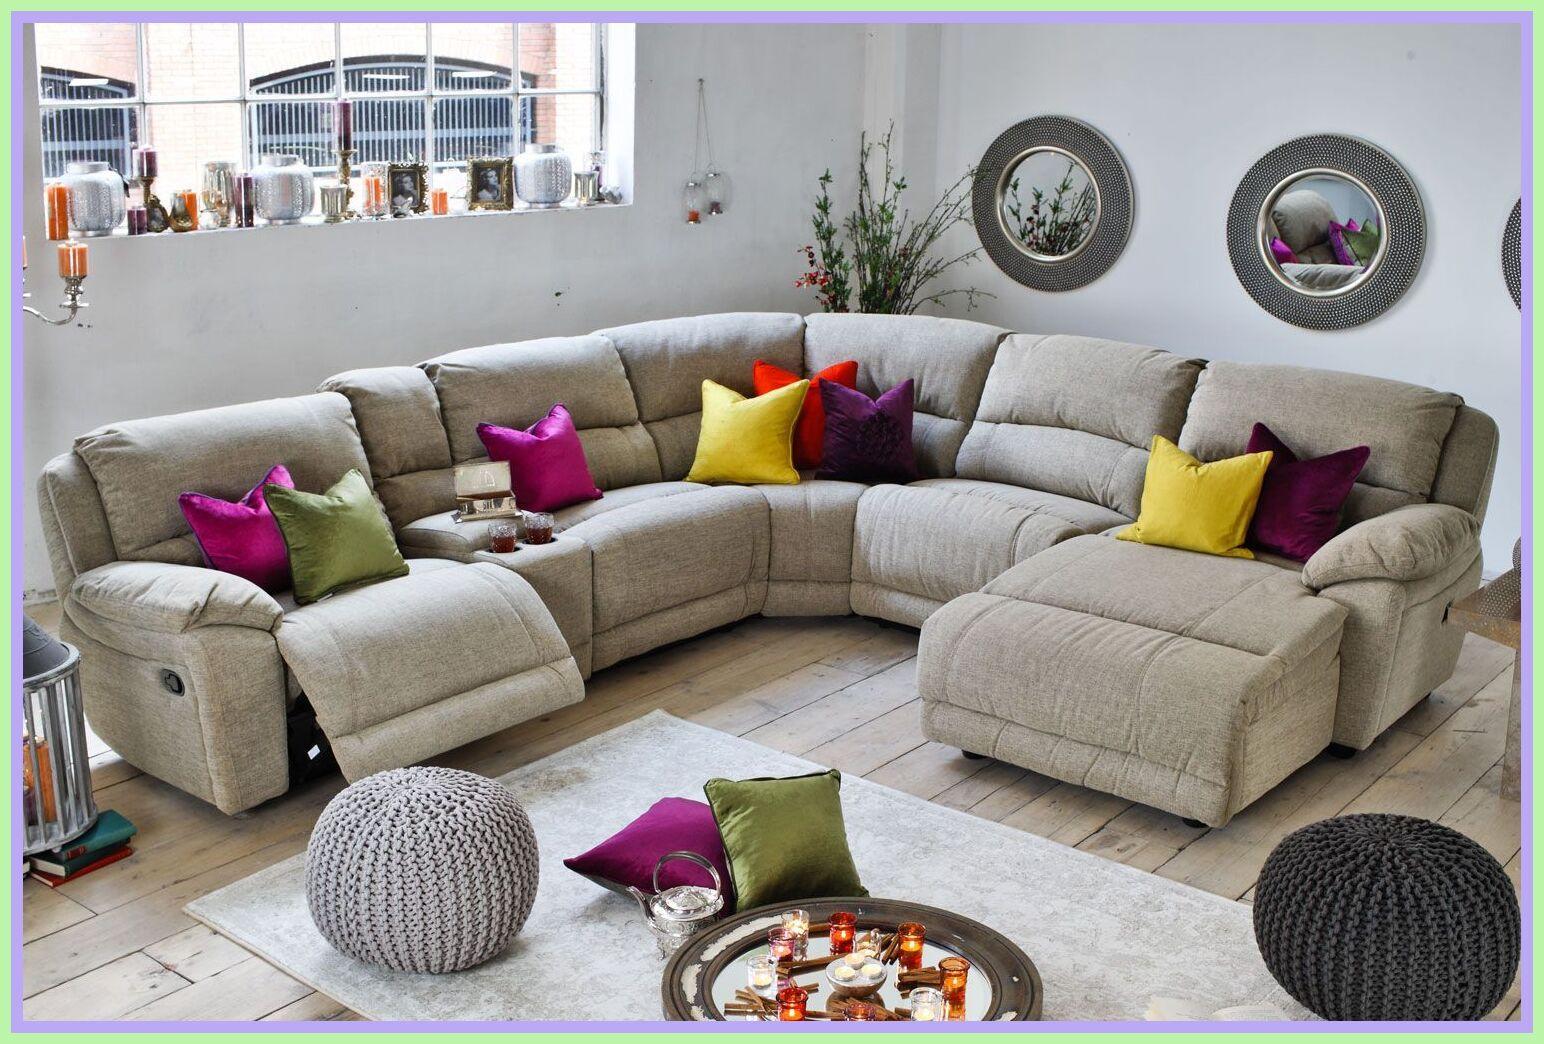 115 Reference Of Recliner Corner Sofa Ireland In 2020 Corner Sofa Ireland Sofa Design Cool Bedroom Furniture